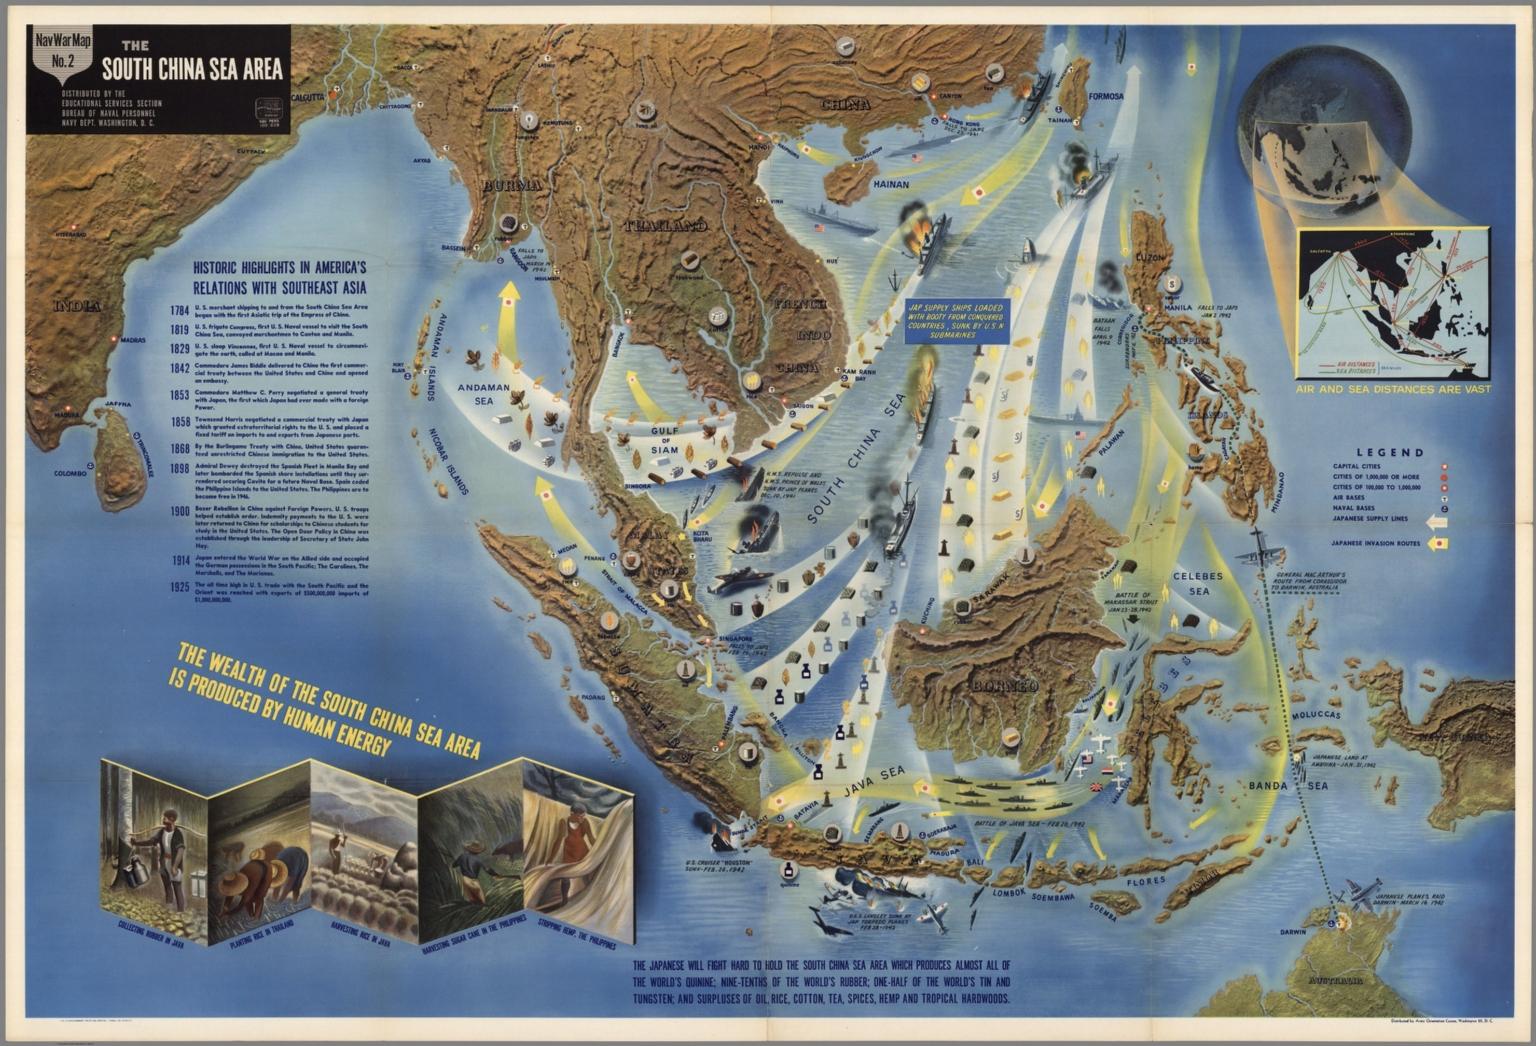 NavWarMap No. 2. The South China Sea Area.